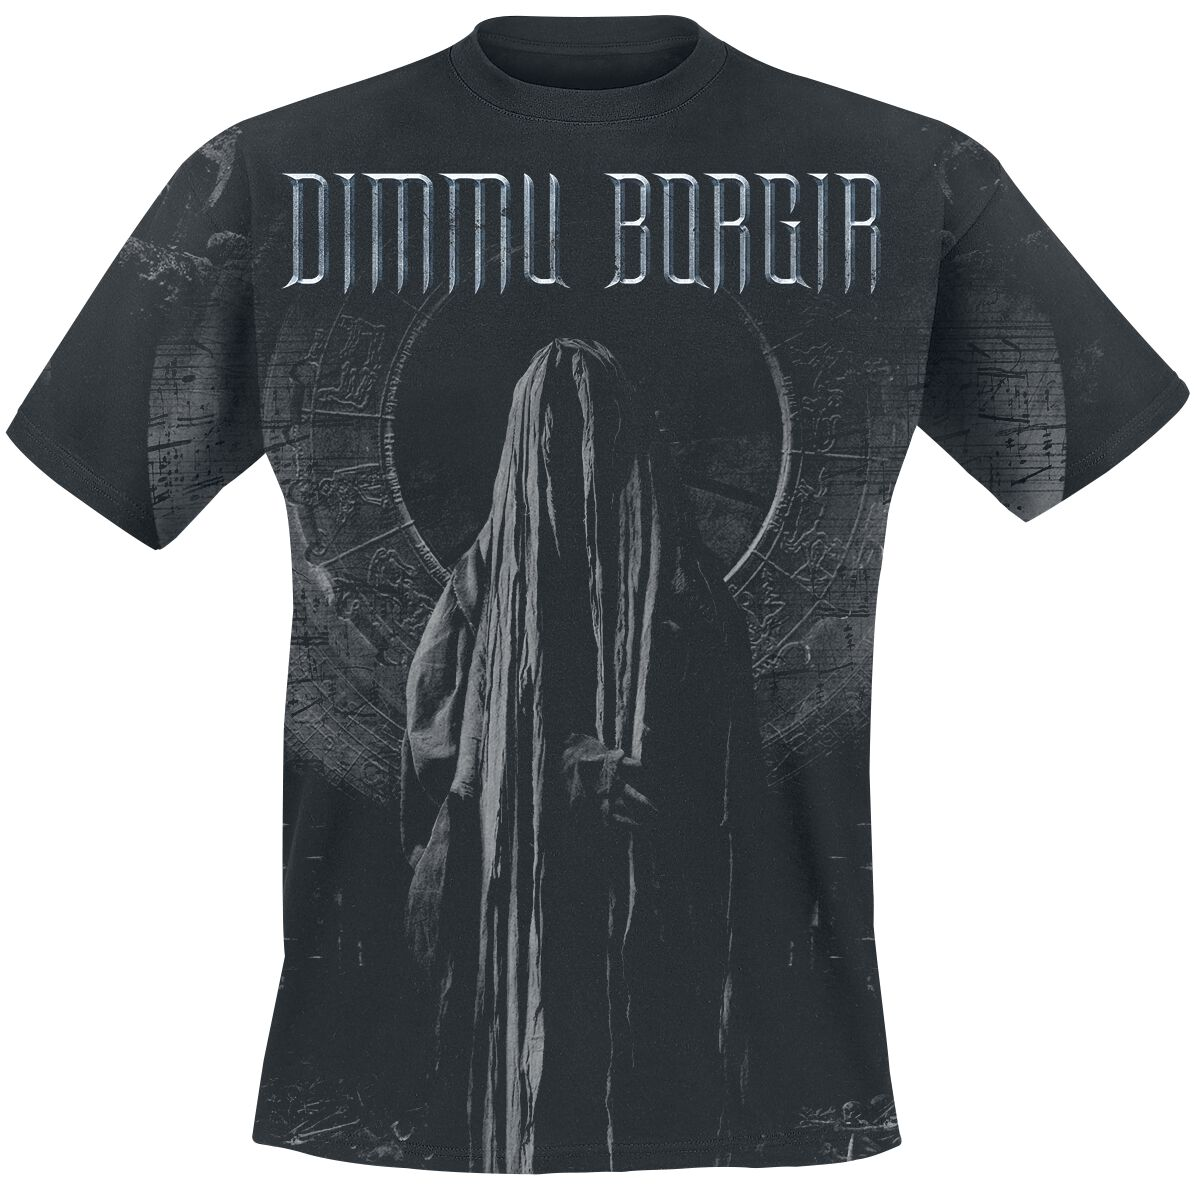 Zespoły - Koszulki - T-Shirt Dimmu Borgir Forces of the Northern Night Allover T-Shirt czarny - 357035